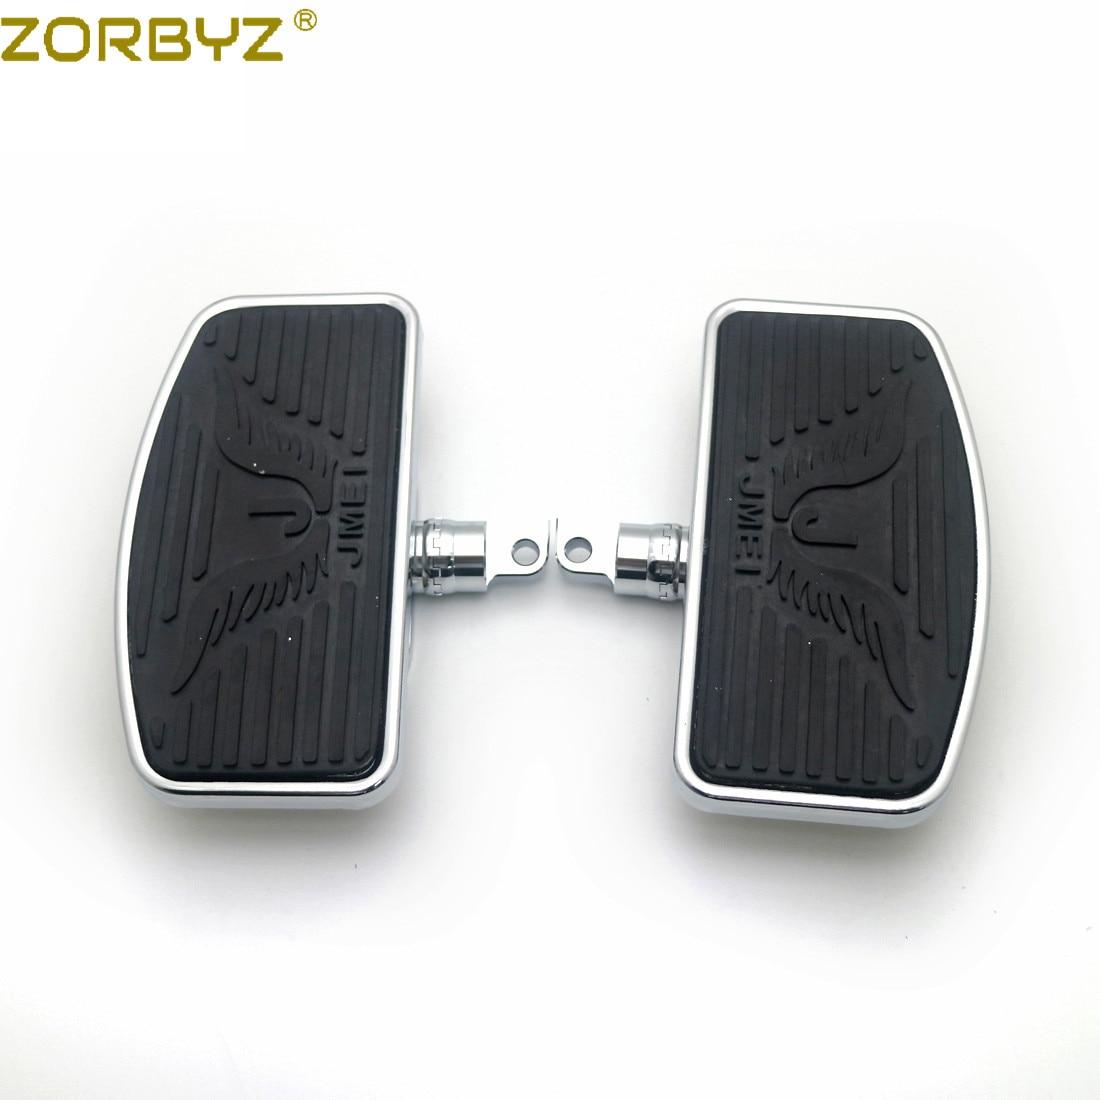 Zorbyz motocicleta ajustável traseiro passenger floorboard estribos para os pés harley sportster 883 1200 dyna